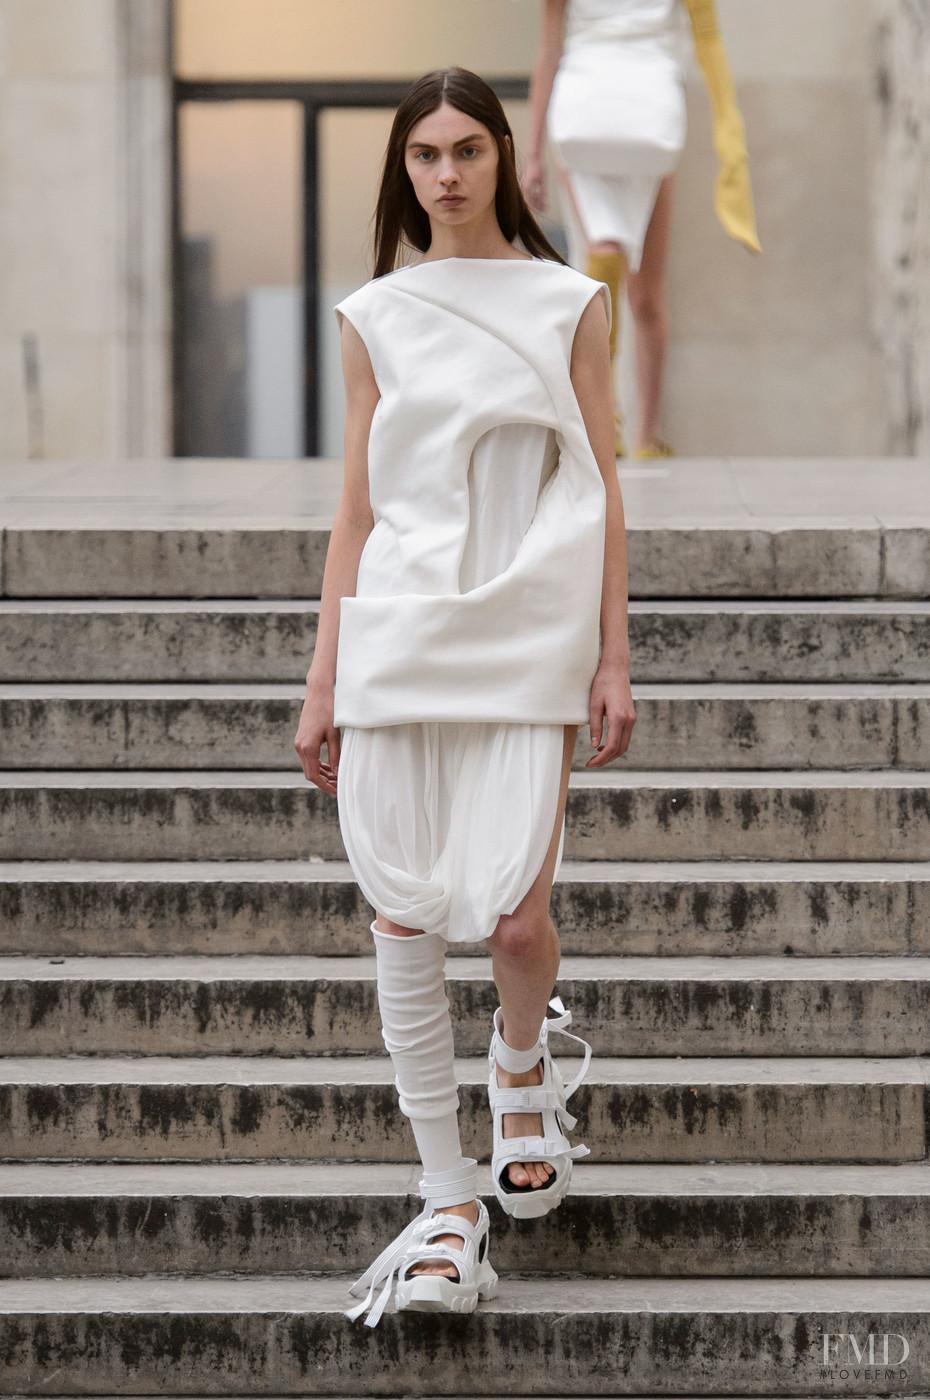 Rick owens fashion show 2018 73